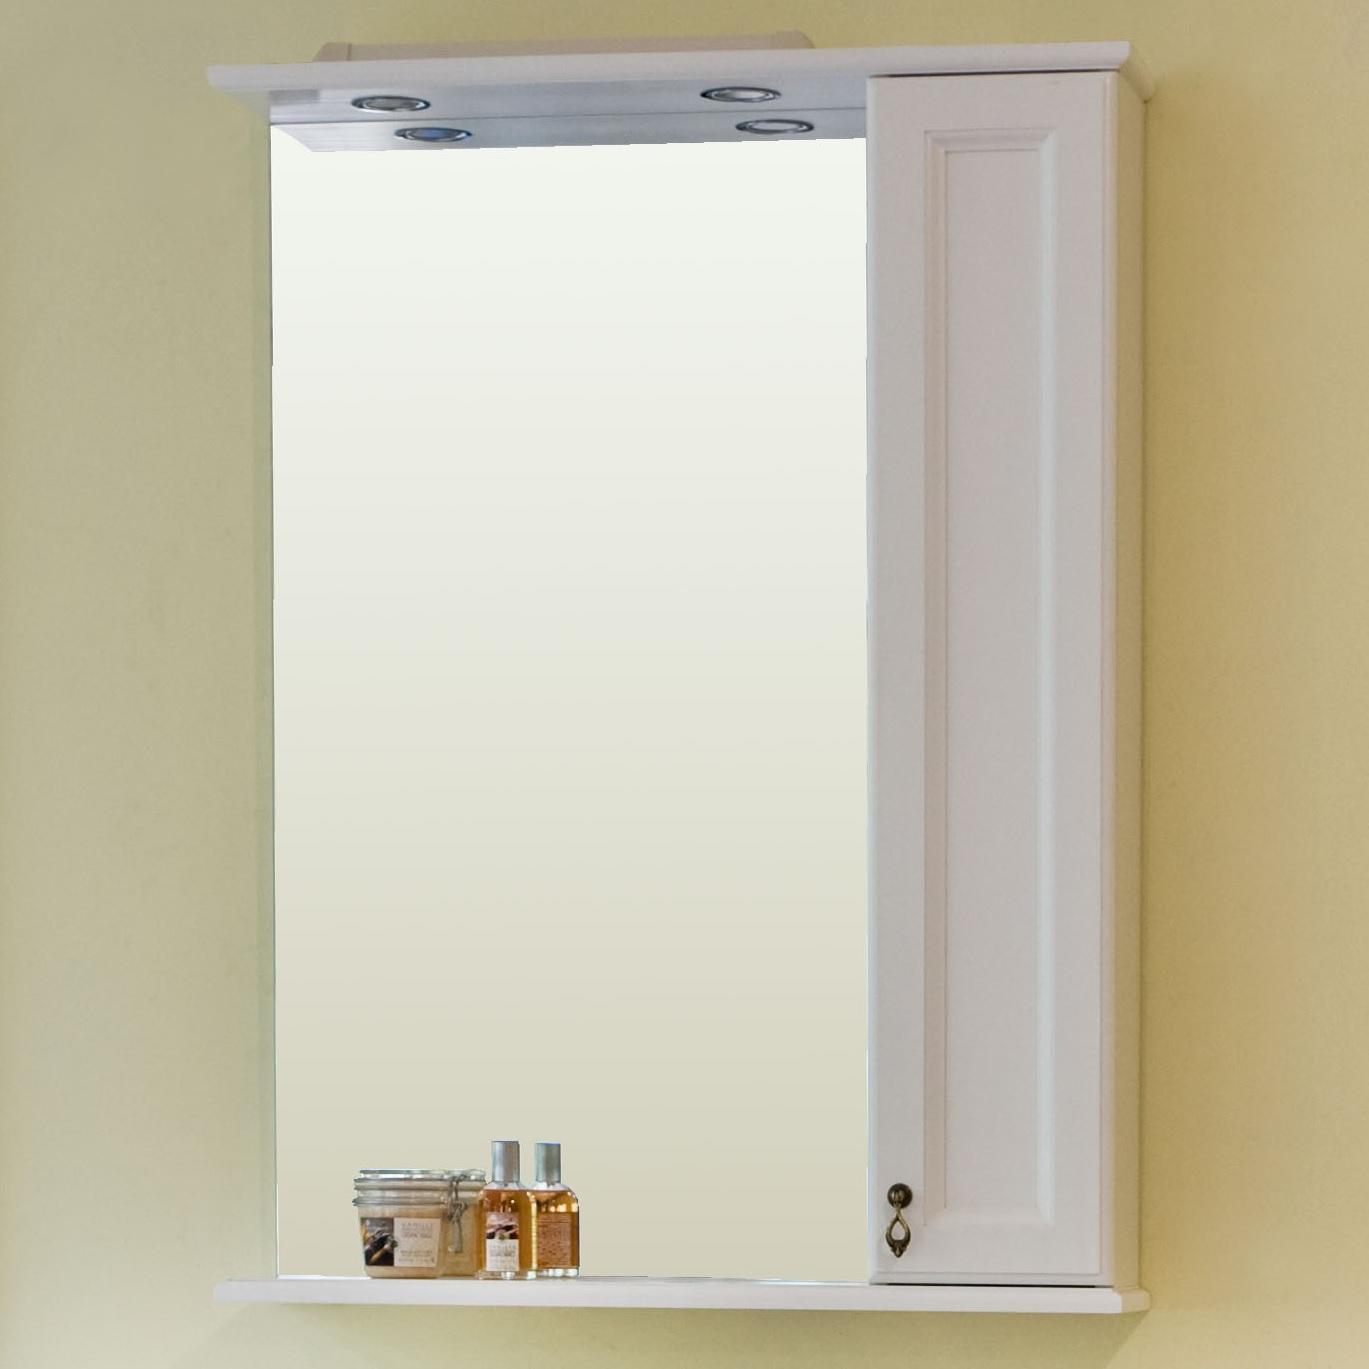 Зеркало Аллигатор МИЛАНА 2-65R/L, с подсветкой и шкафчиком, 65*17*99,5 см